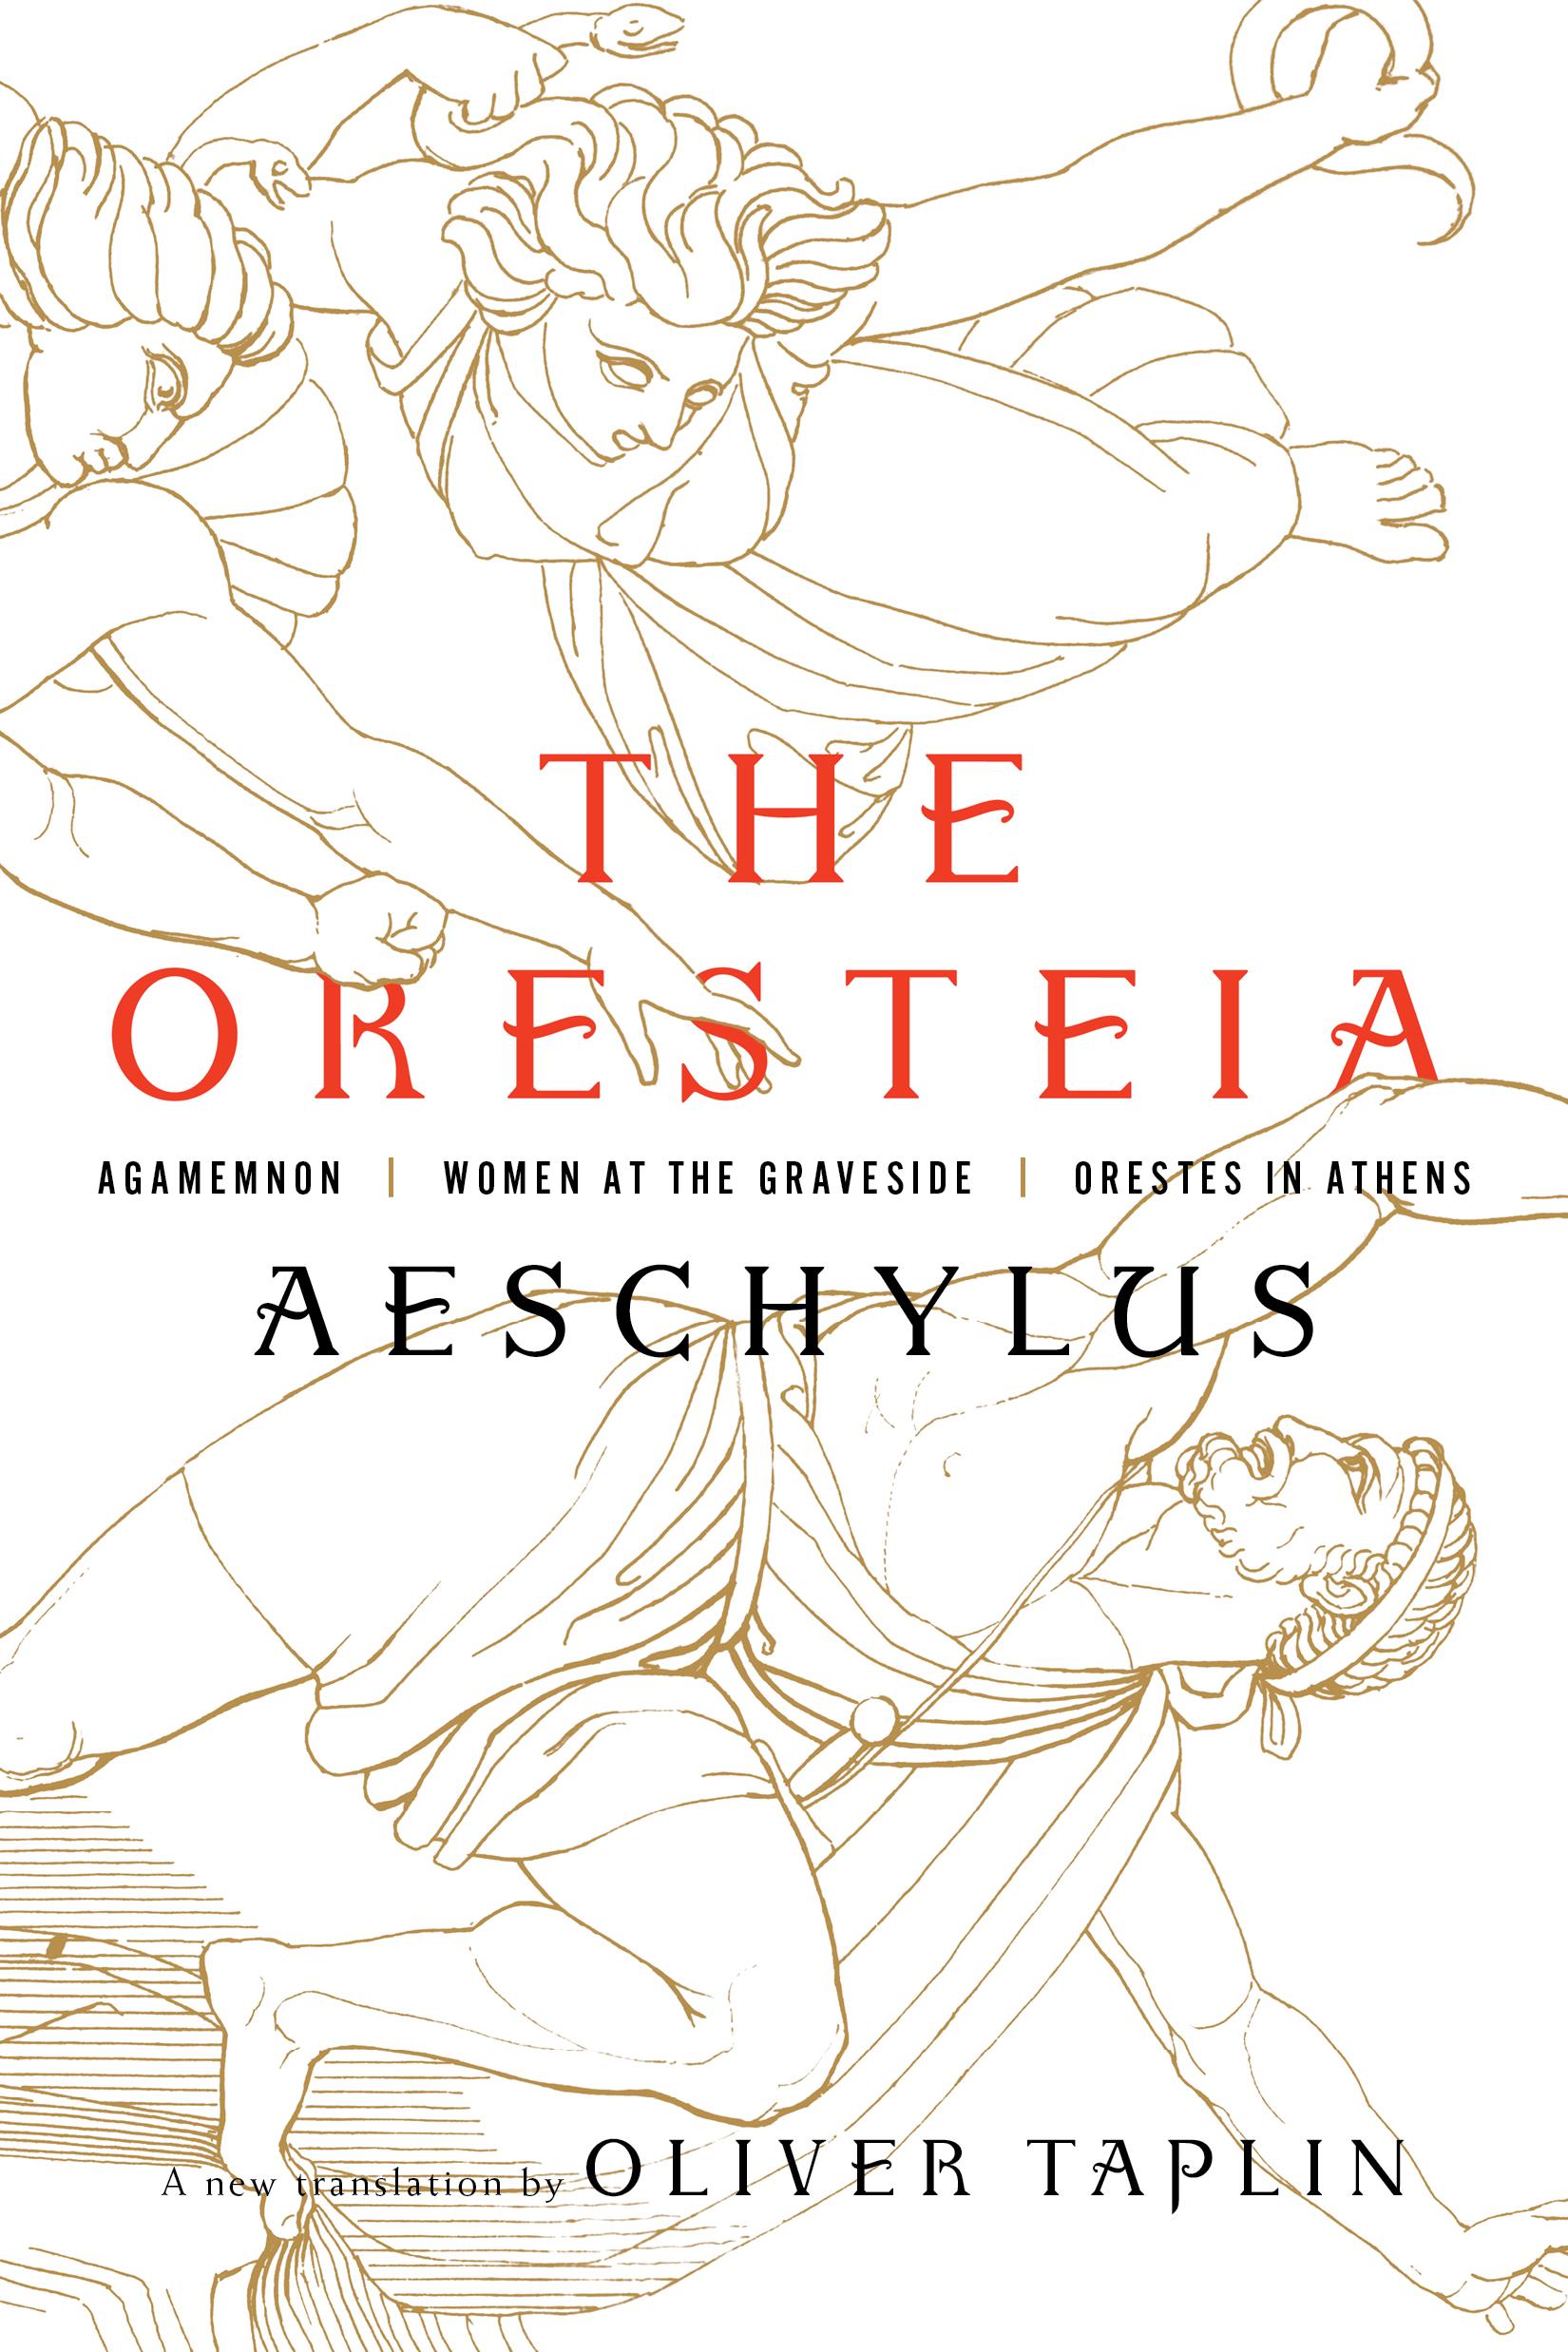 TheOresteia.jpg